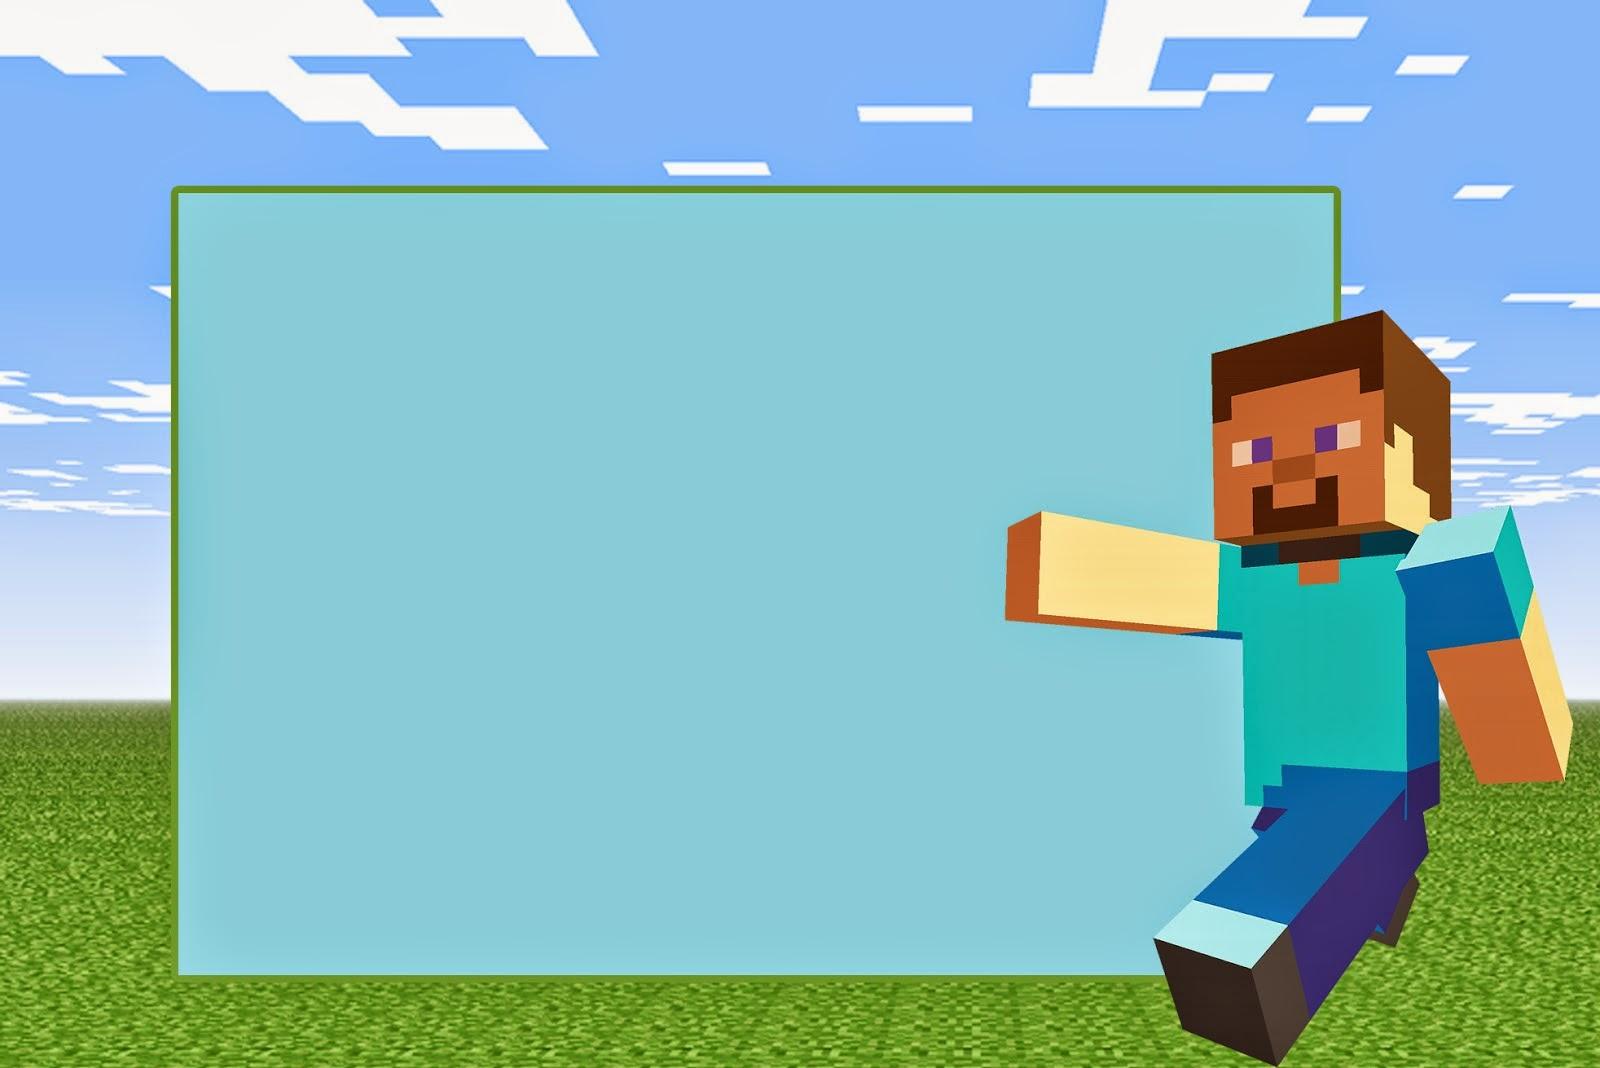 Picareta Minecraft Png.